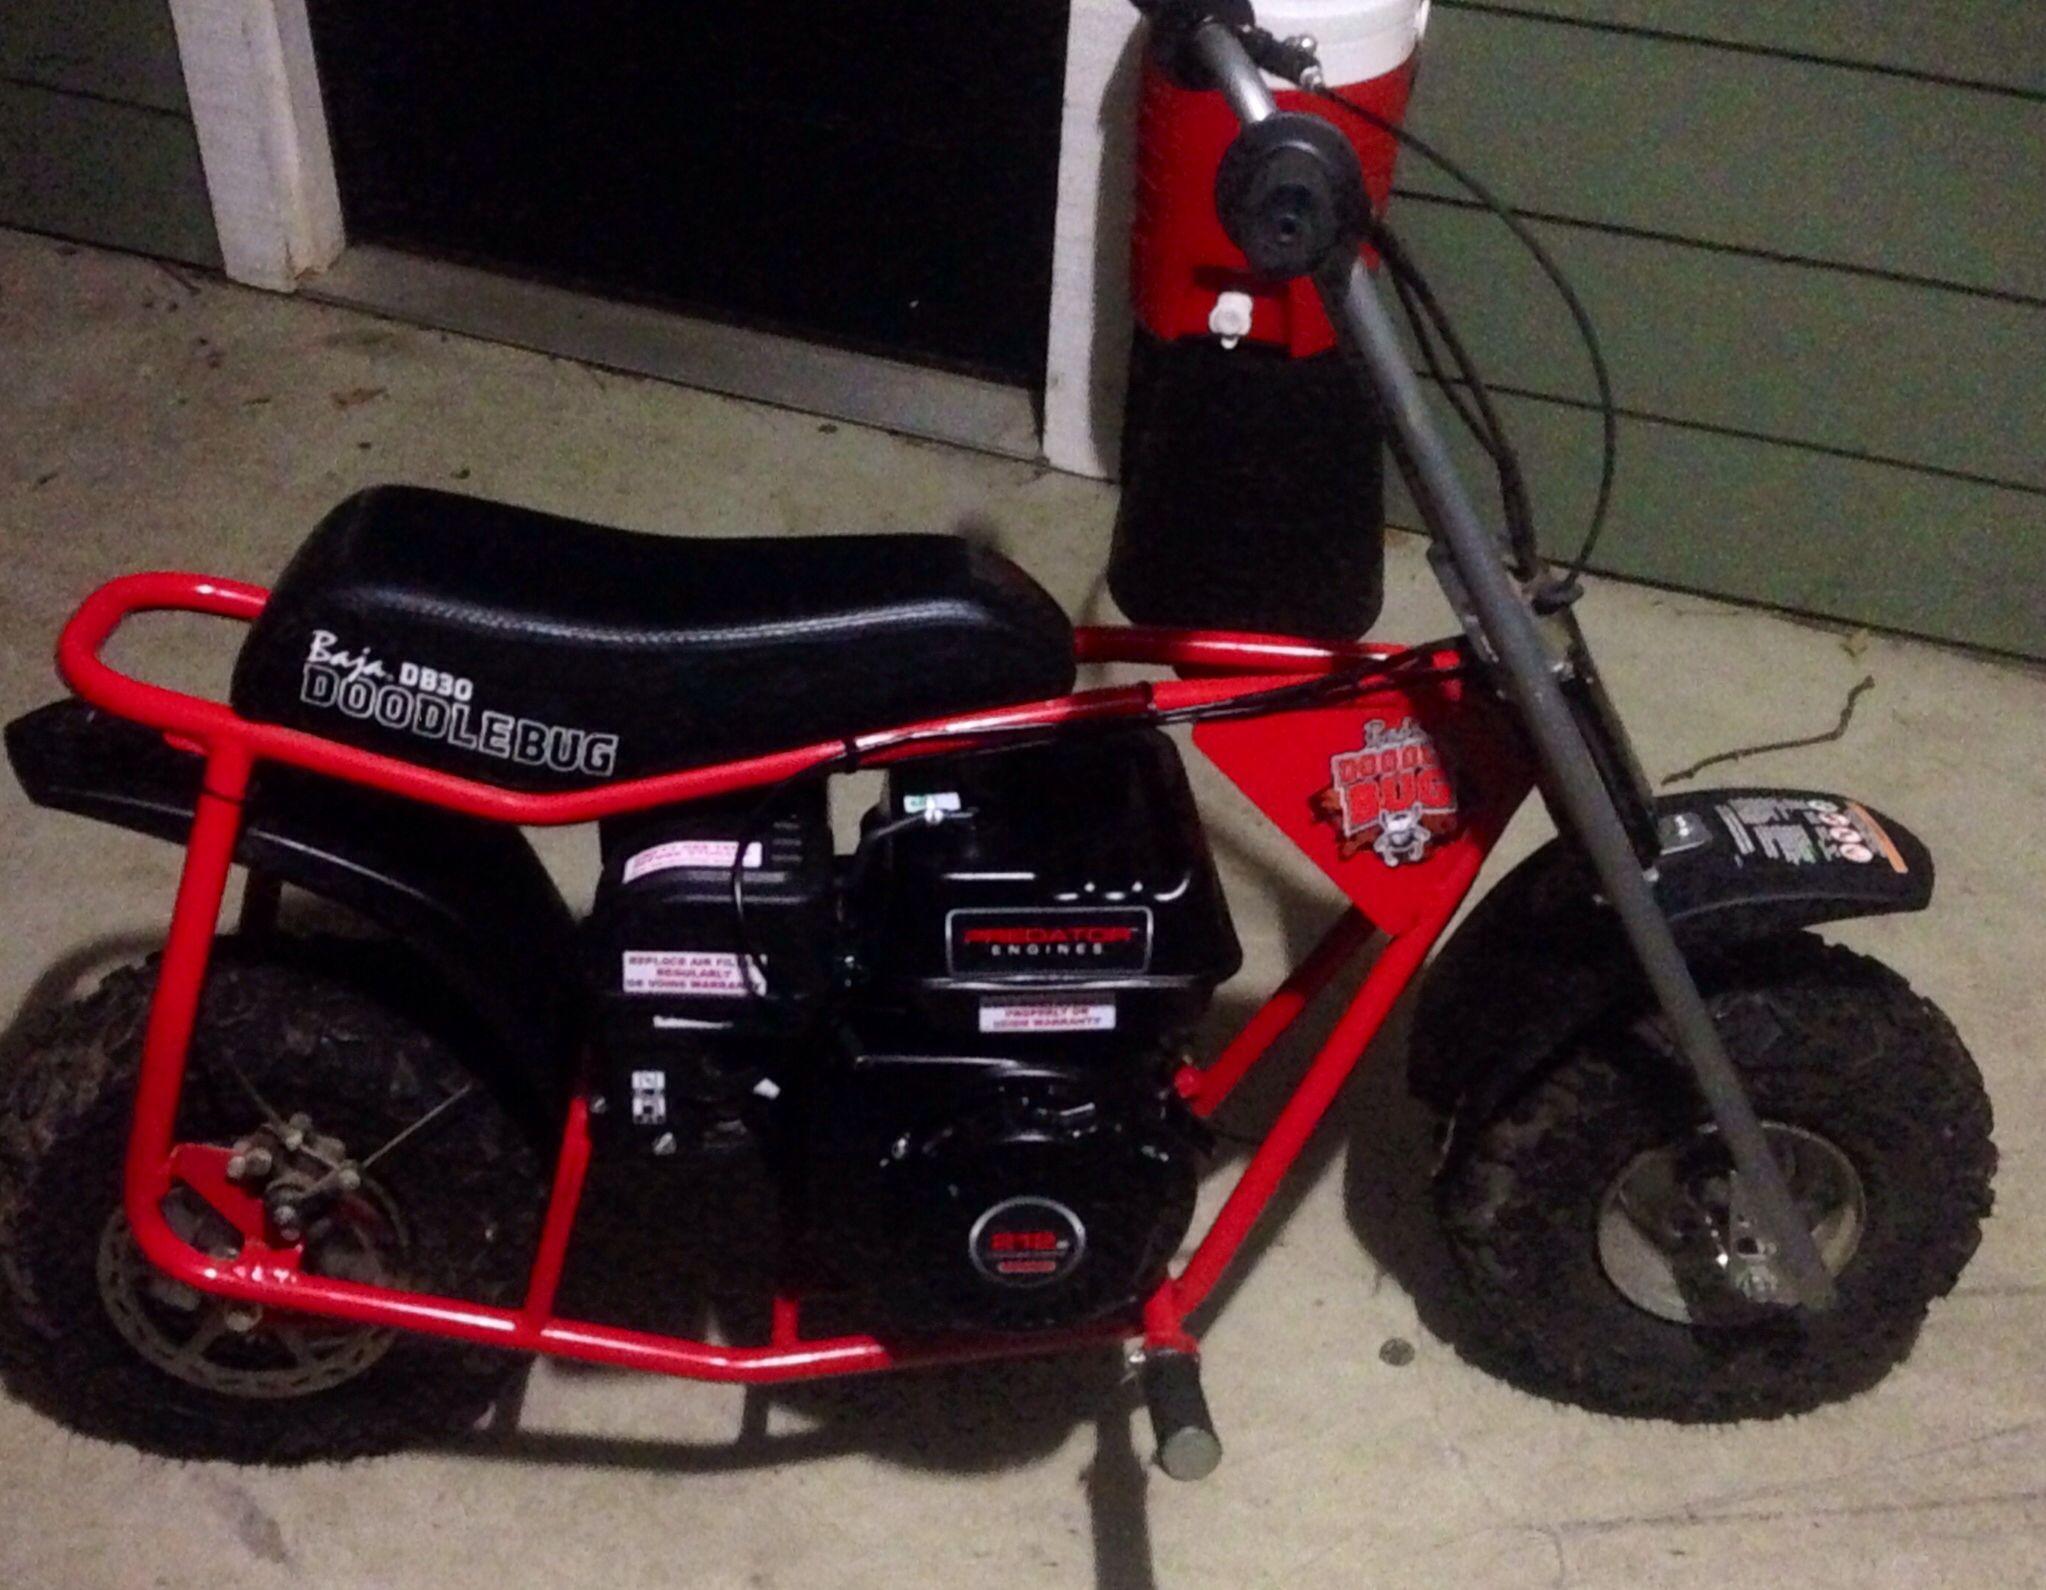 DB30 with predator 212 | Rante's Garage | Vehicles, Garage, Motorcycle